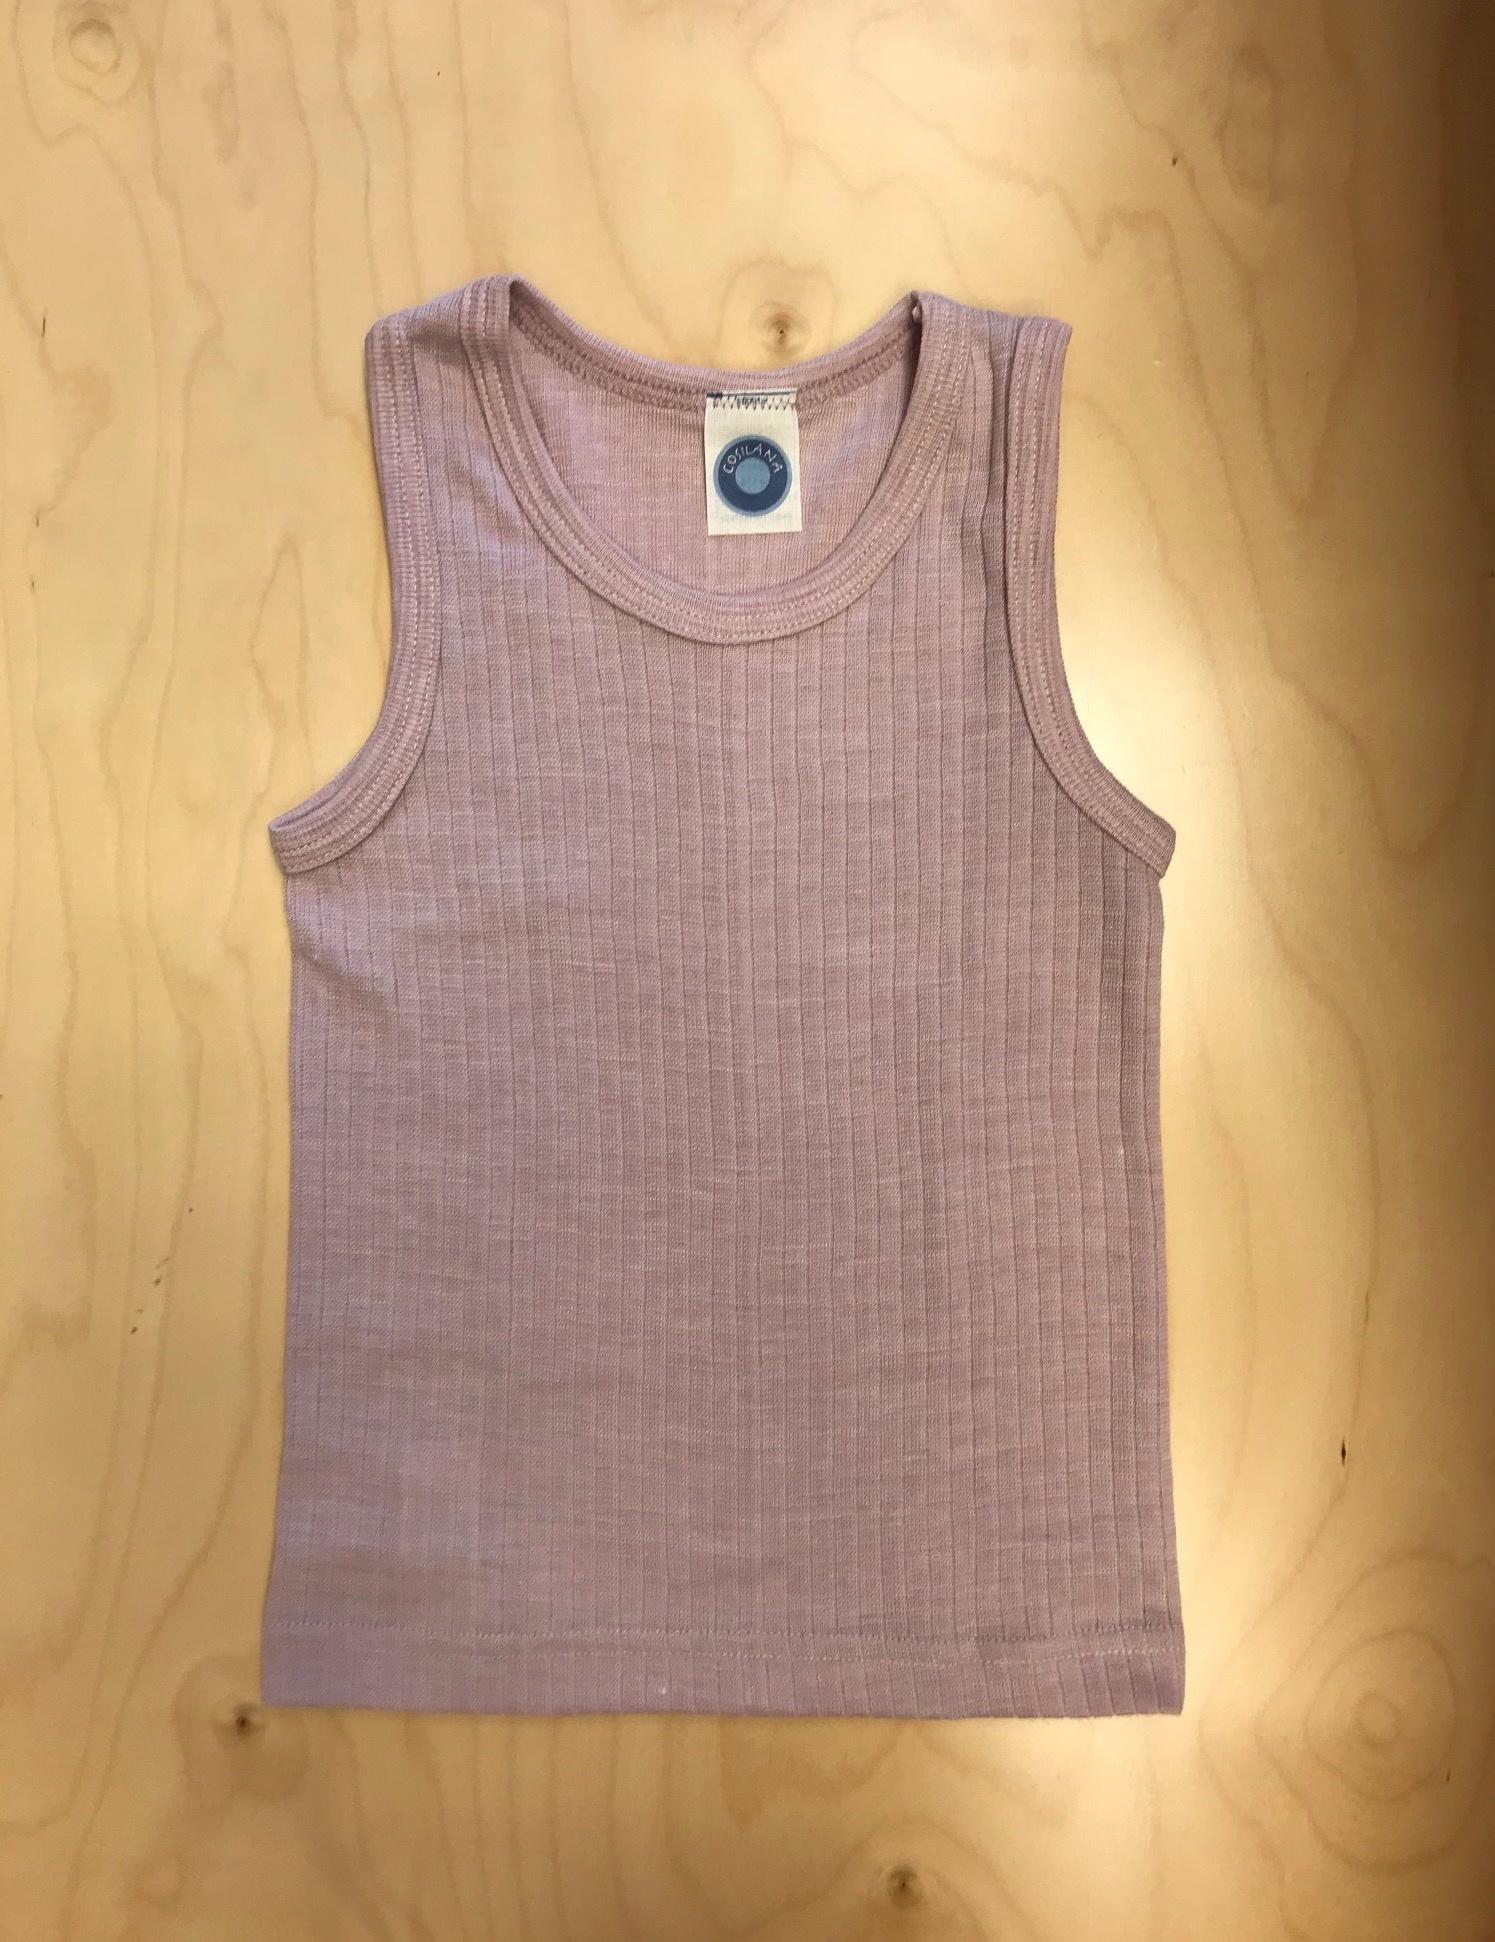 Cosilana Cosilana Wol/Zijde/Katoen hemd - Roze (62)